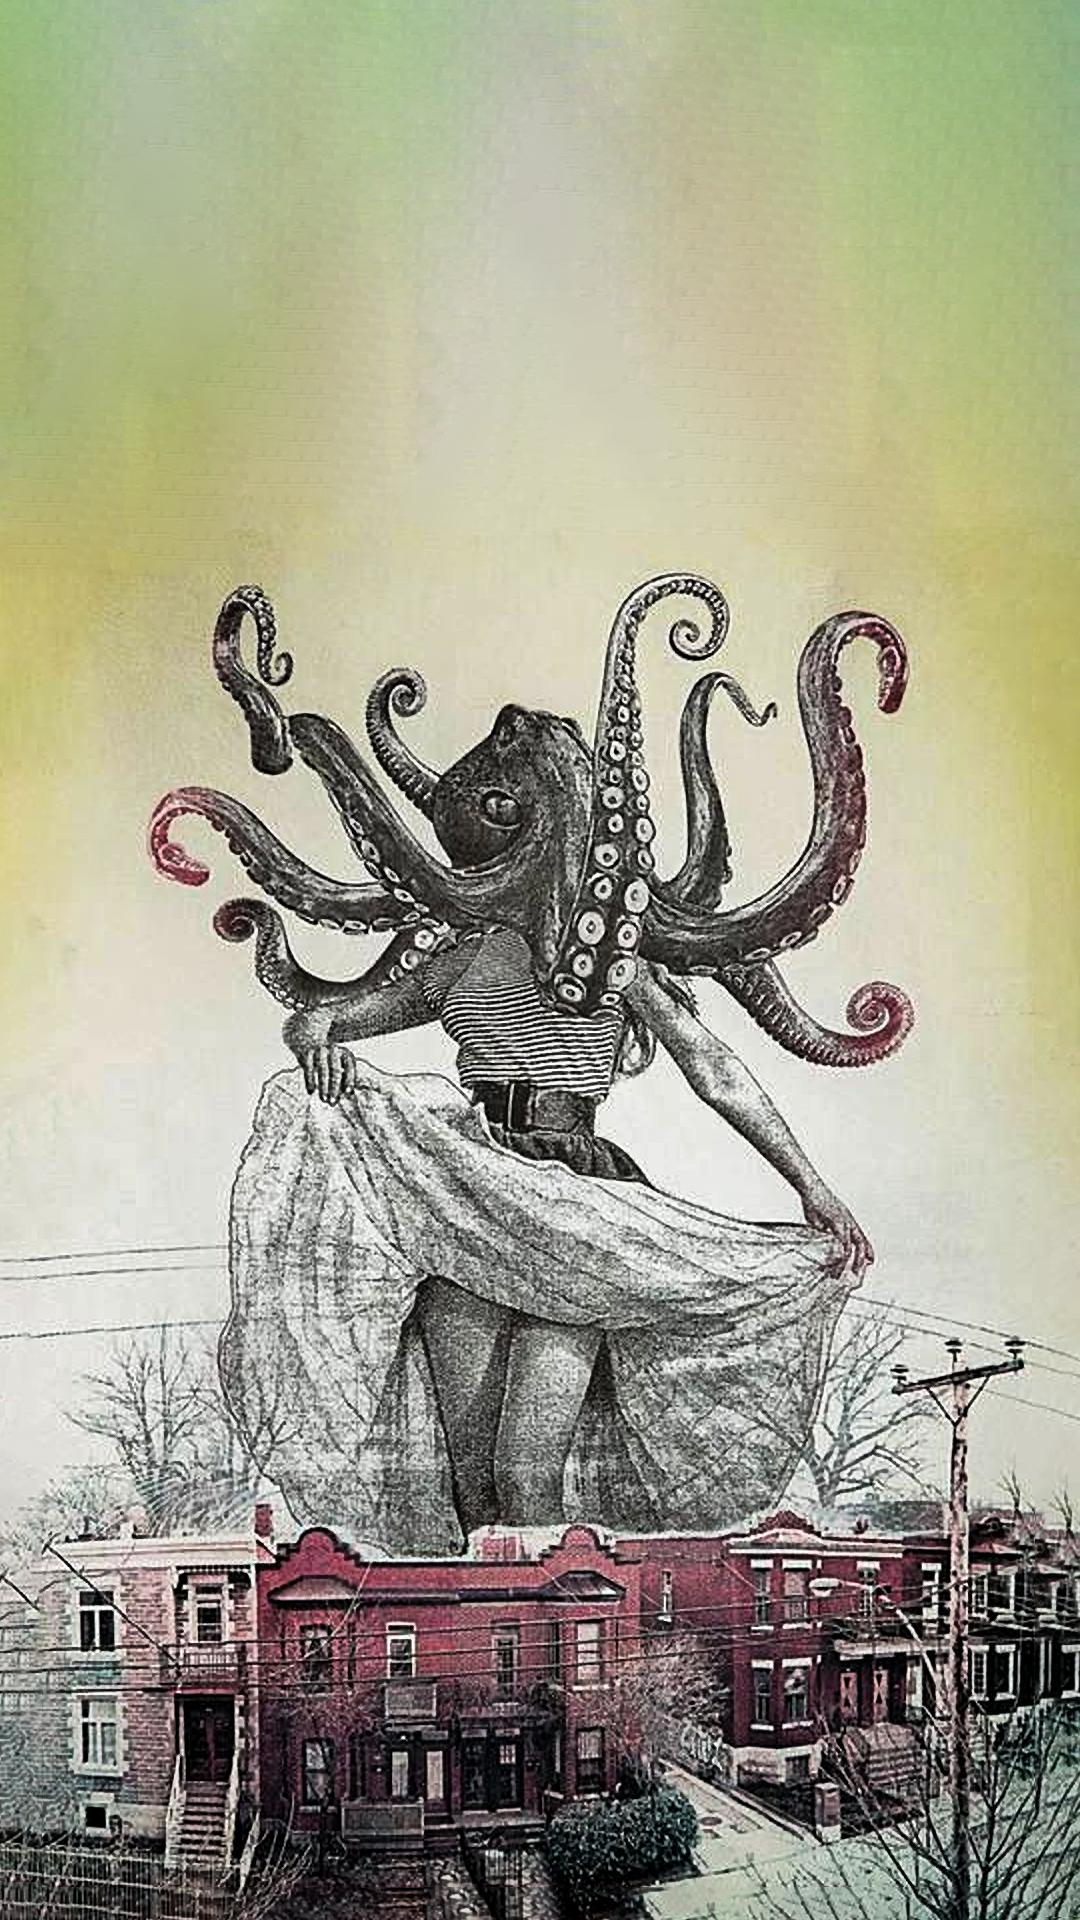 Cthulhu Woman [Art By Jason Contoro] Download at: http://www.myfavwallpaper.com/2018/02/cthulhu-woman-art-by-jason-contoro.html #iphonewallpaper #phonewallpaper #background #wallpaper #myfavwallpaper